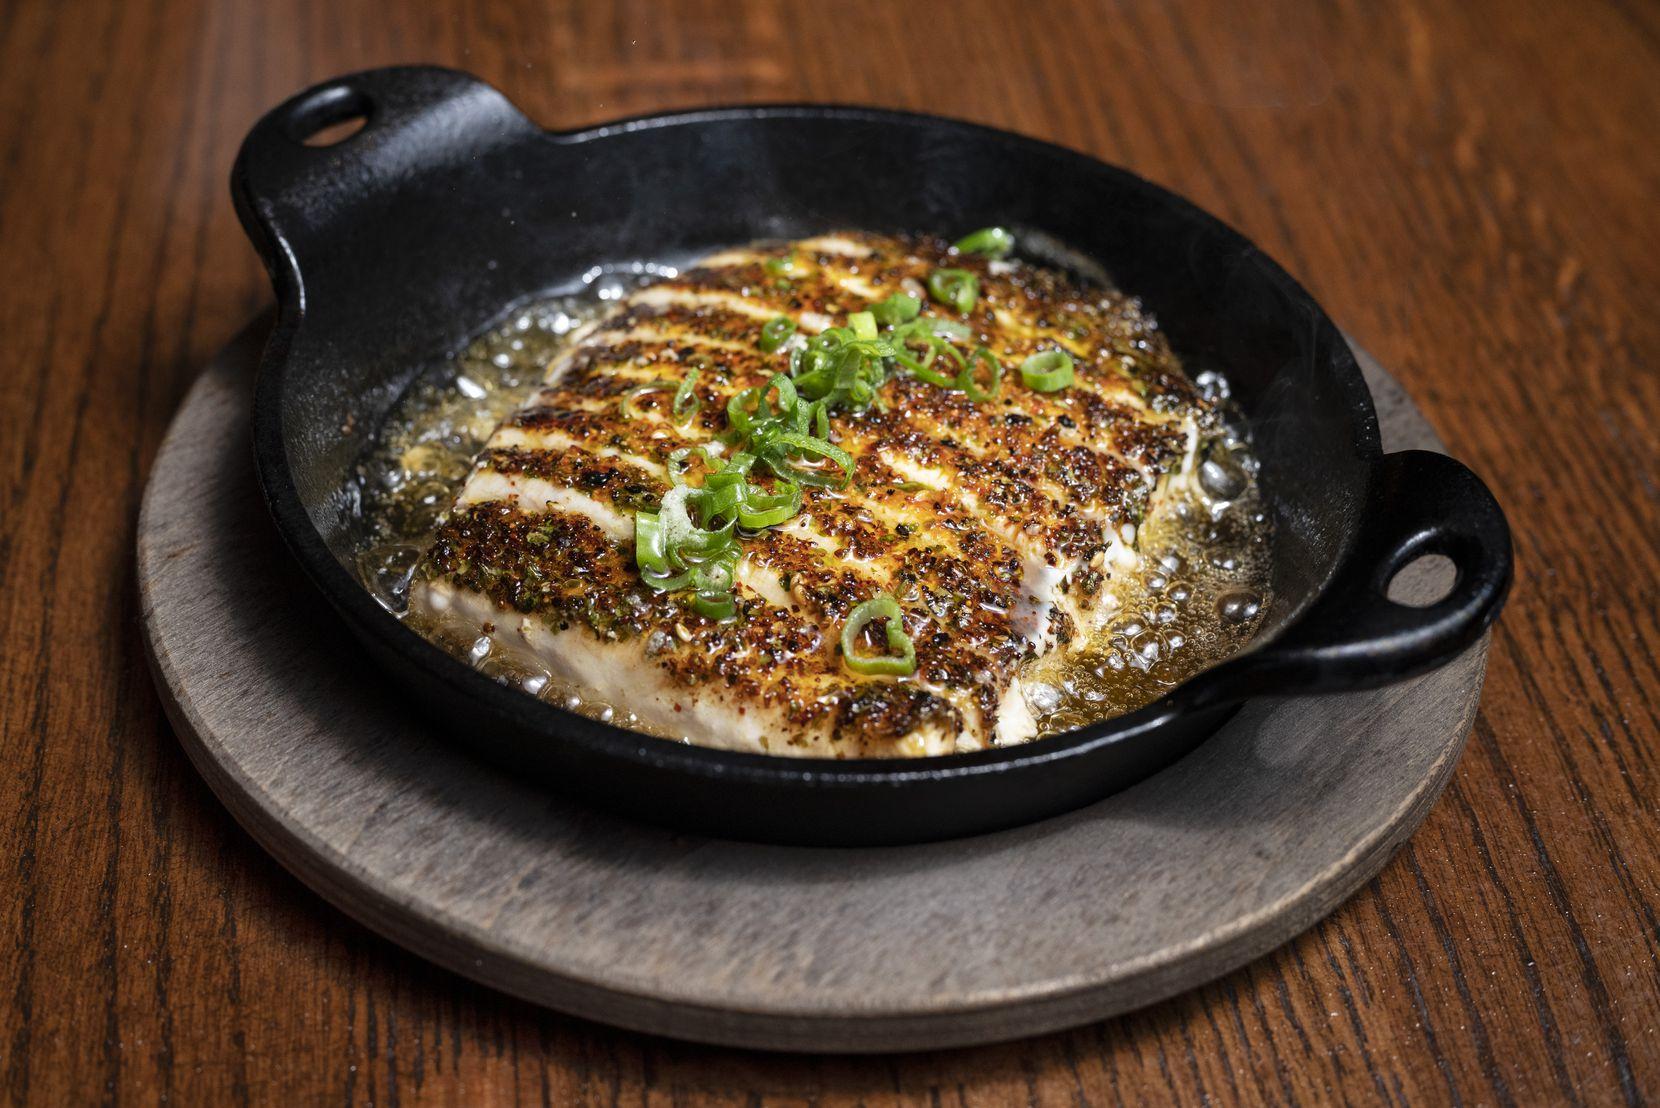 Cast Iron Swordfish with ginger, lemongrass and garlic butter from Shinsei restaurant